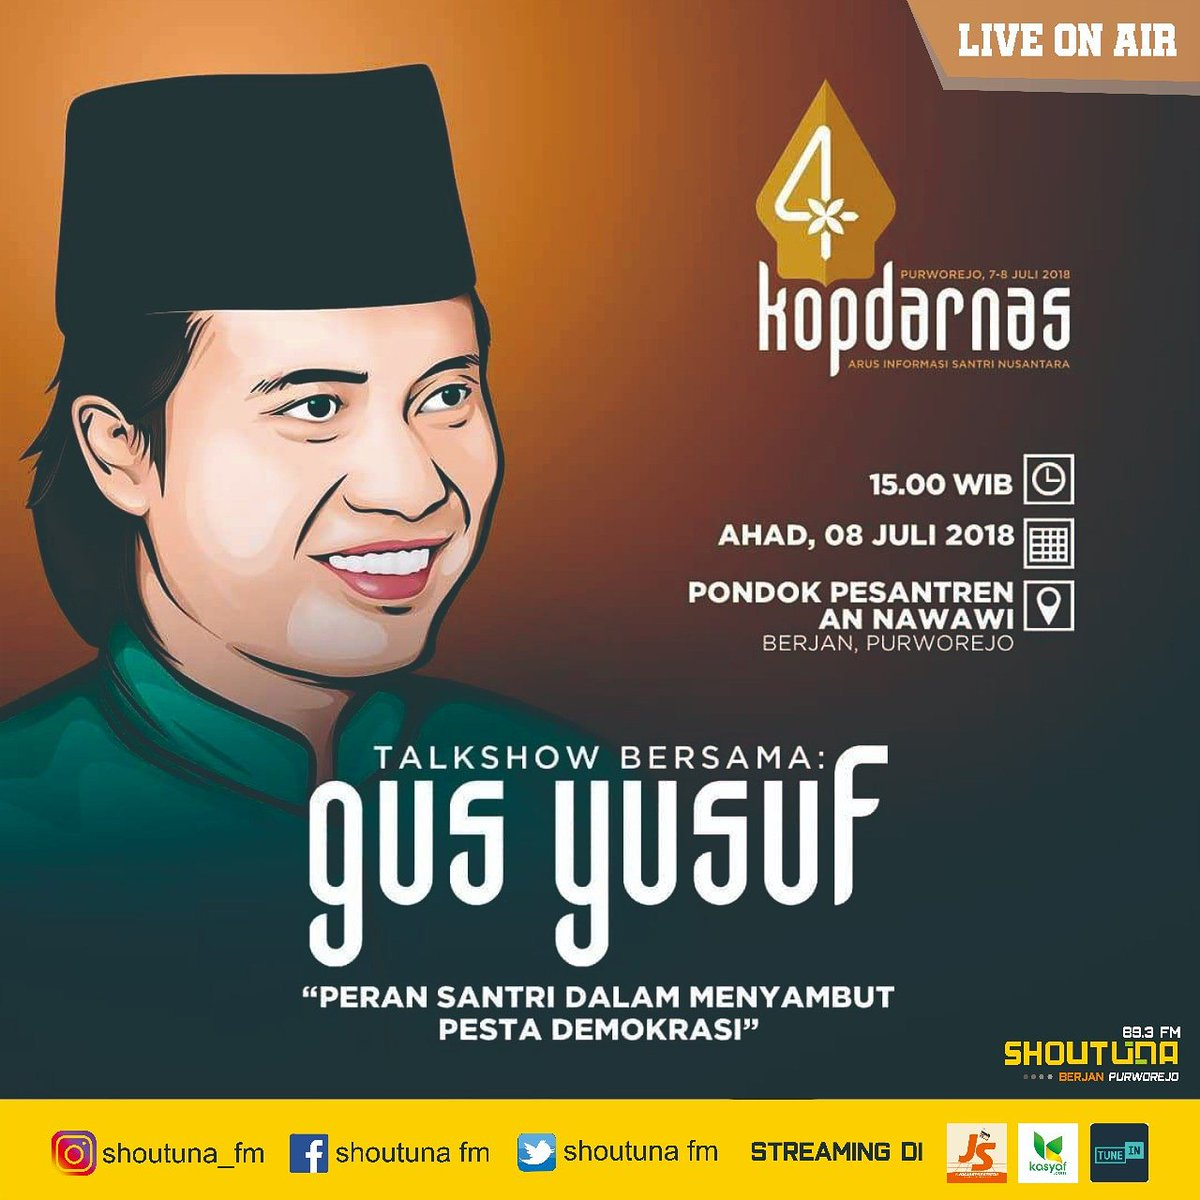 "KOPDDARNAS 4 AIS NUSANTARA . Live Talk Show Bersama Gus Yusuf Chudlori  tema "" Peran Santri Dalam Menyambut Pesta Demokrasi "" . Ahad, 08 Juli 2018 Pukul 15.00 WIB. . #annawawi #kopdarnas4 #kopdarnasais4 #kopdar #kopdarnas #IndonesiaLebihNyantri #guesantri #purworejo"